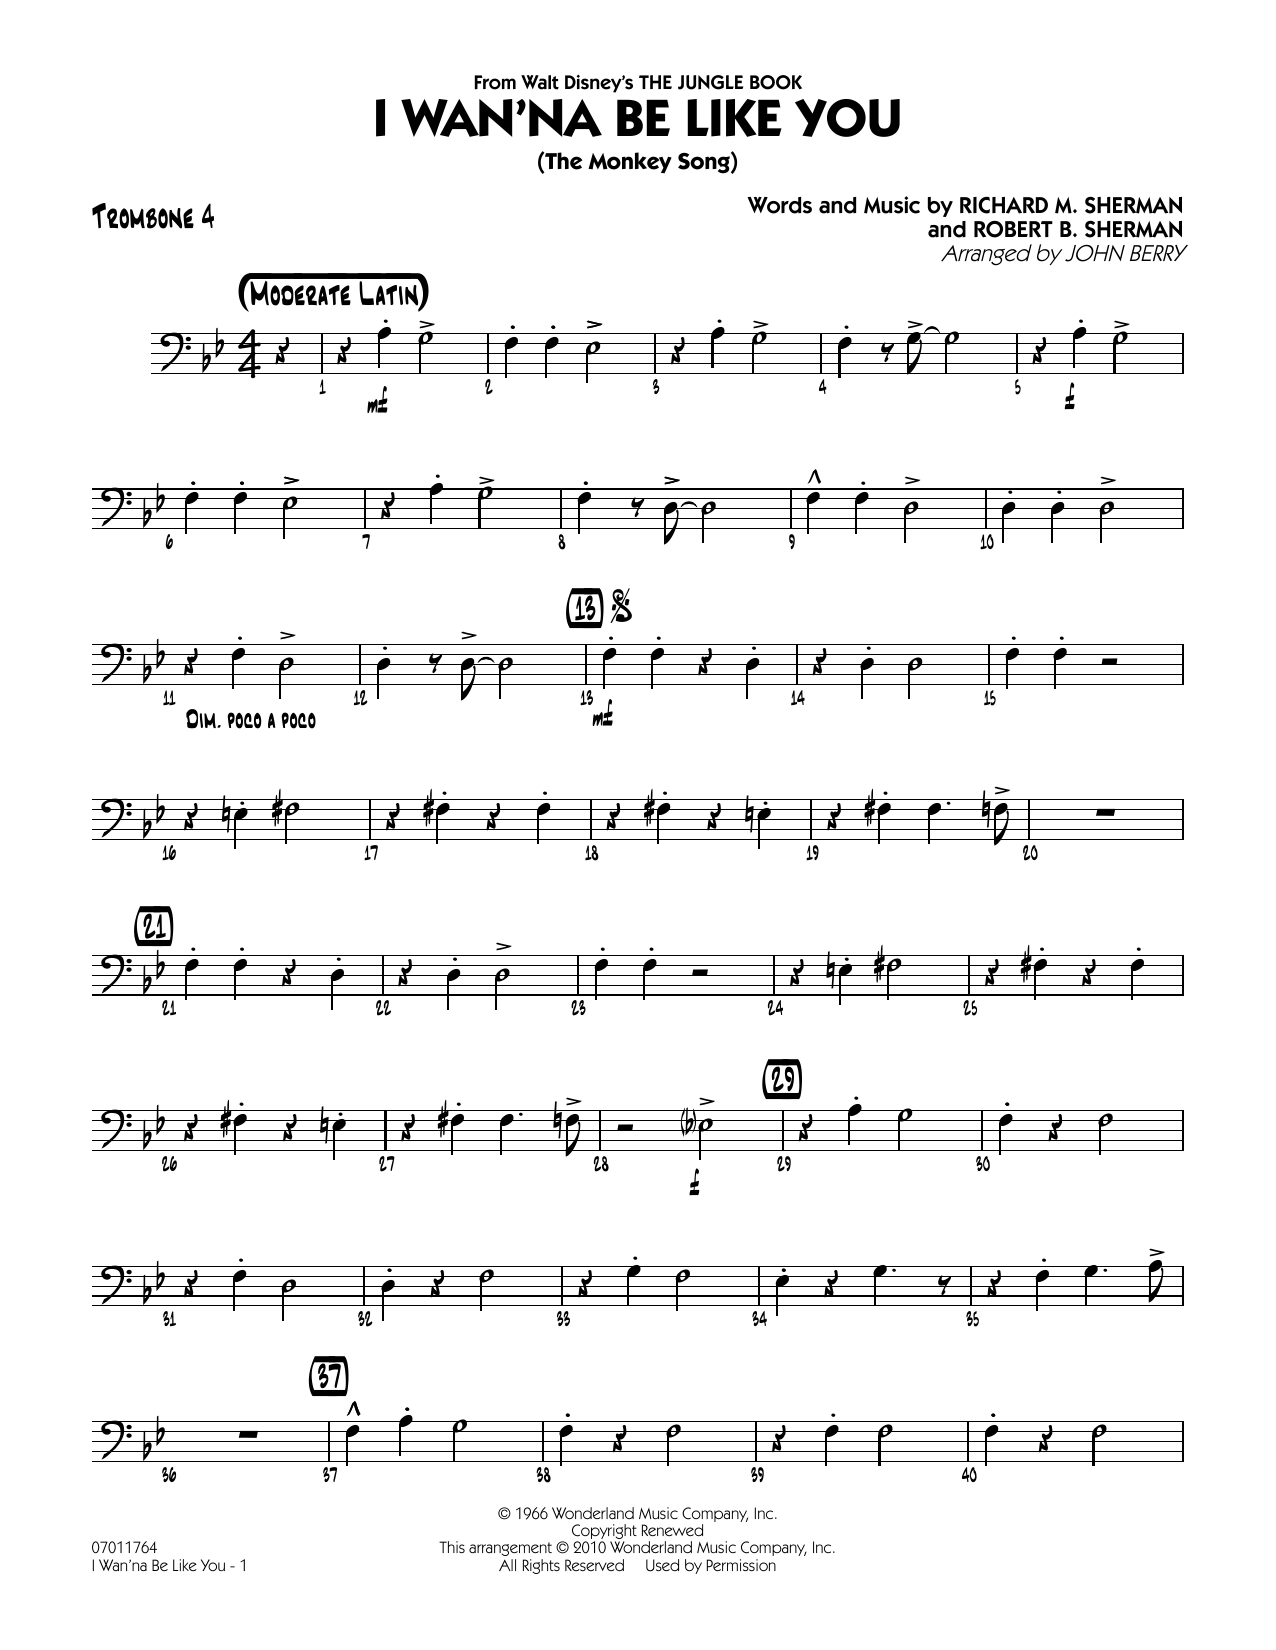 John Berry I Wan Na Be Like You The Monkey Song Trombone 4 Sheet Music Pdf Notes Chords Latin Score Jazz Ensemble Download Printable Sku 293130